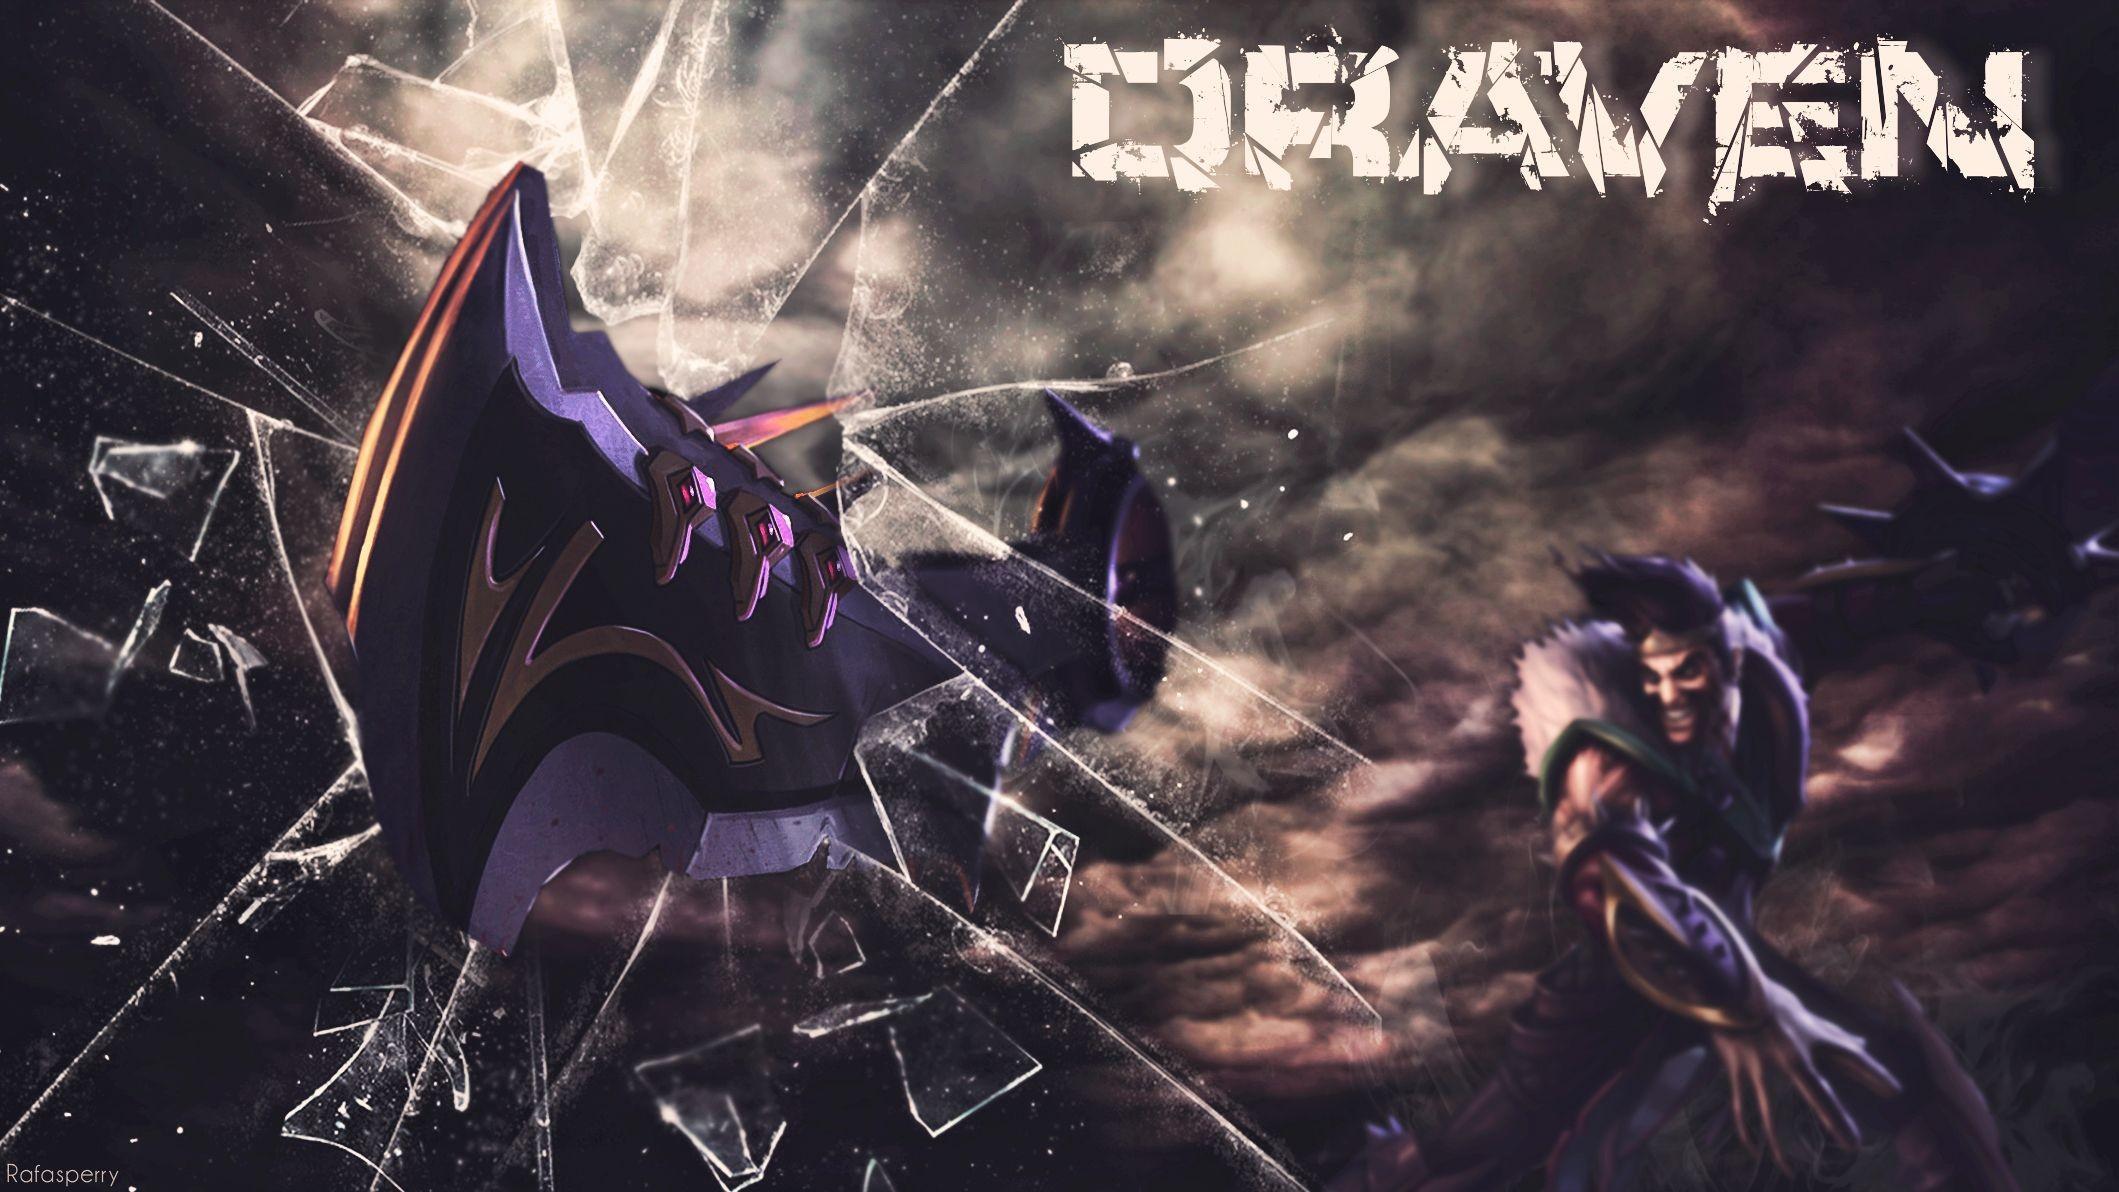 Draven wallpaper ·① Download free backgrounds for desktop